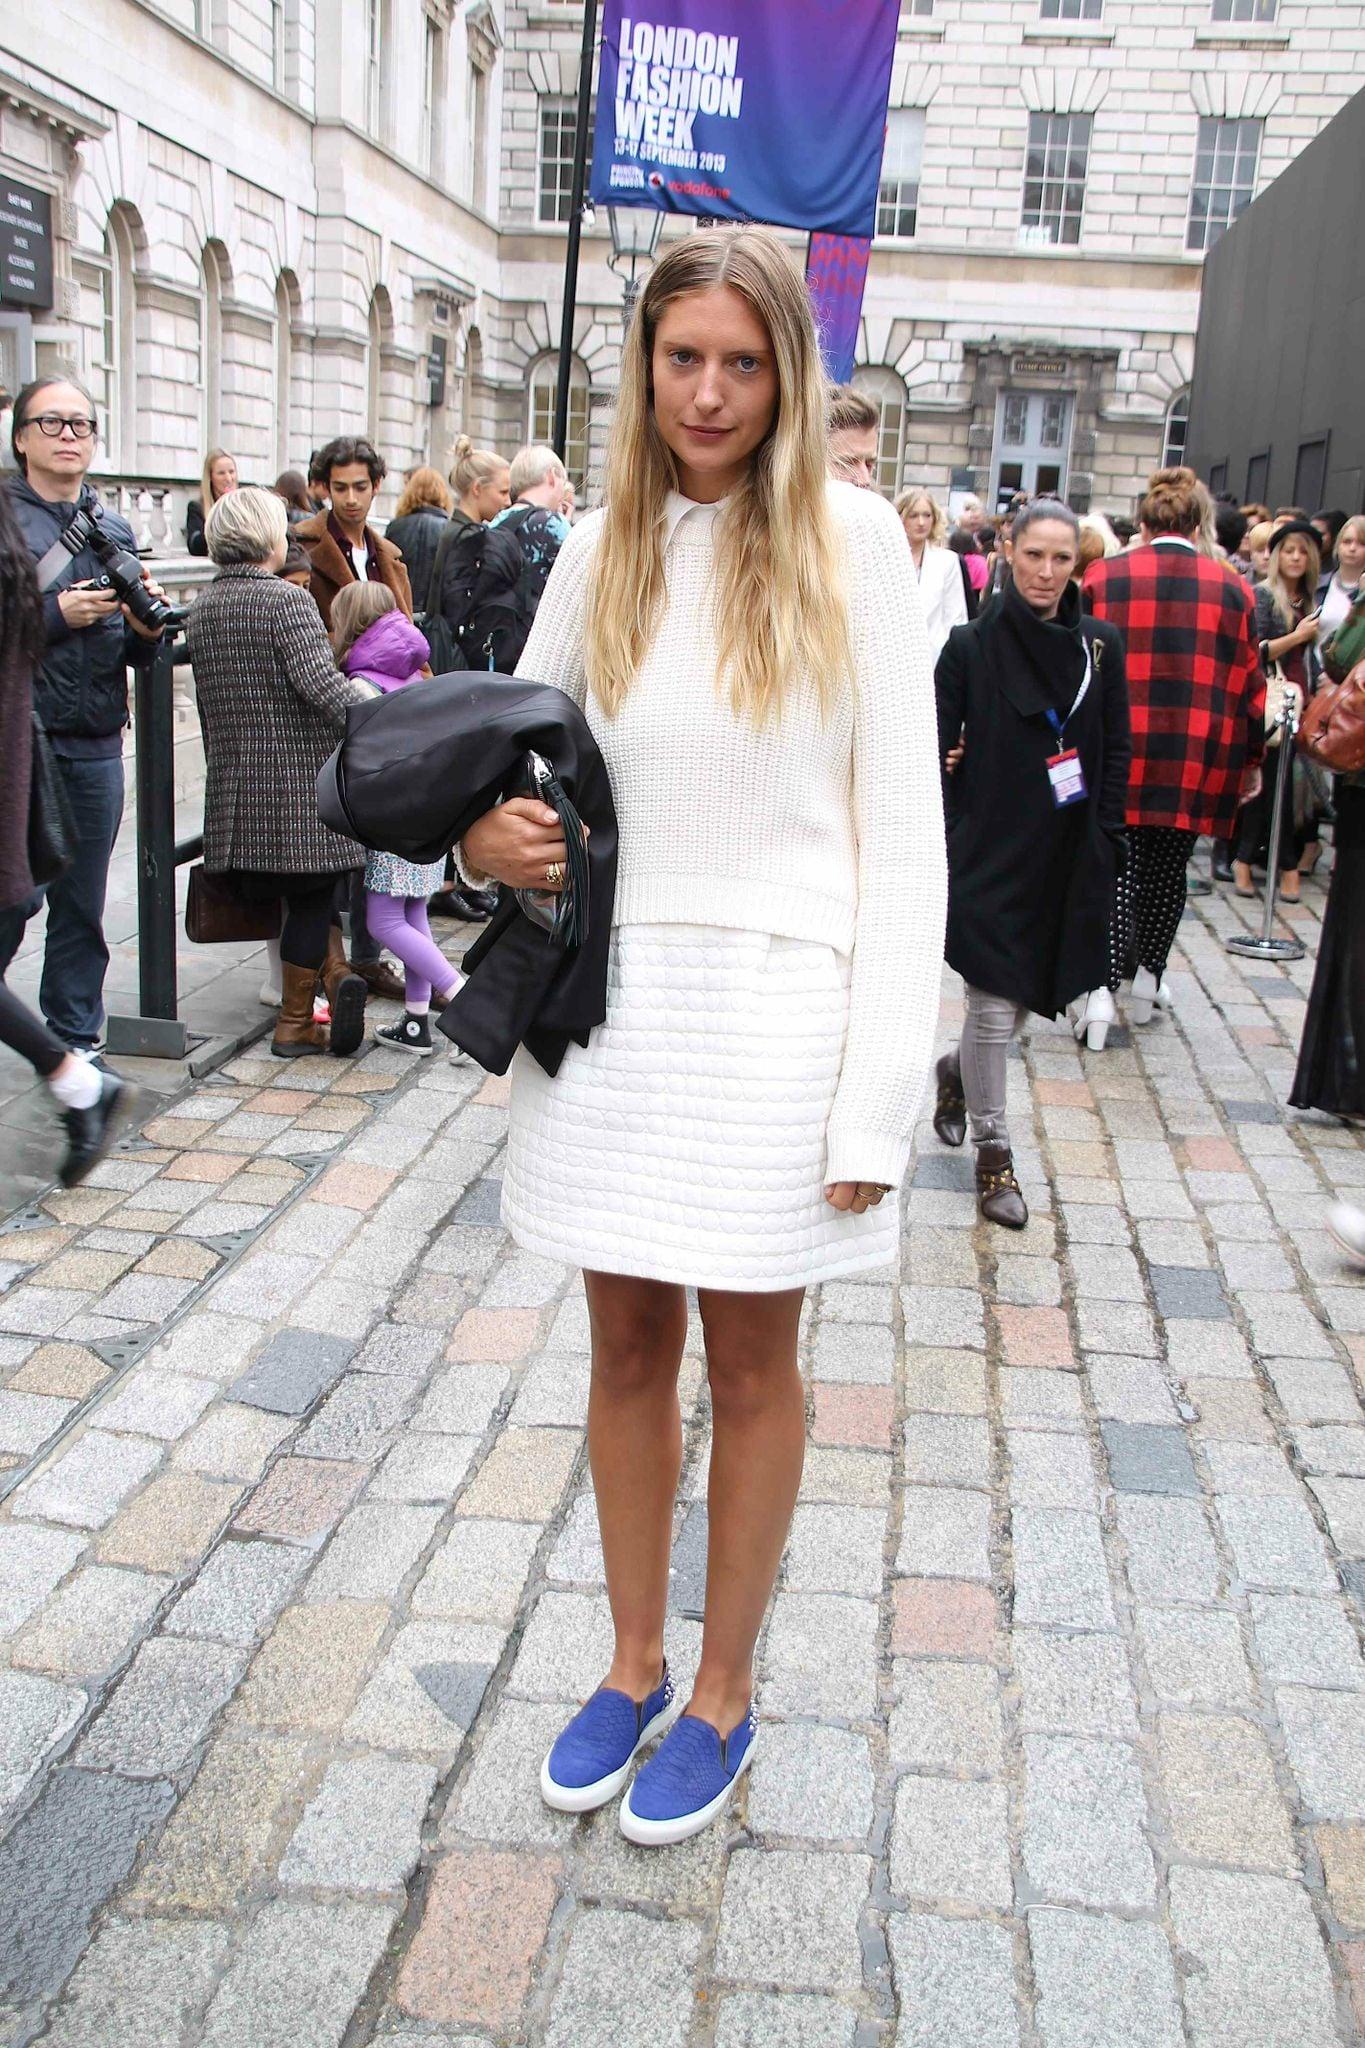 Slip-on sneakers gave her look a tomboy twist. Source: Hannah Freeman